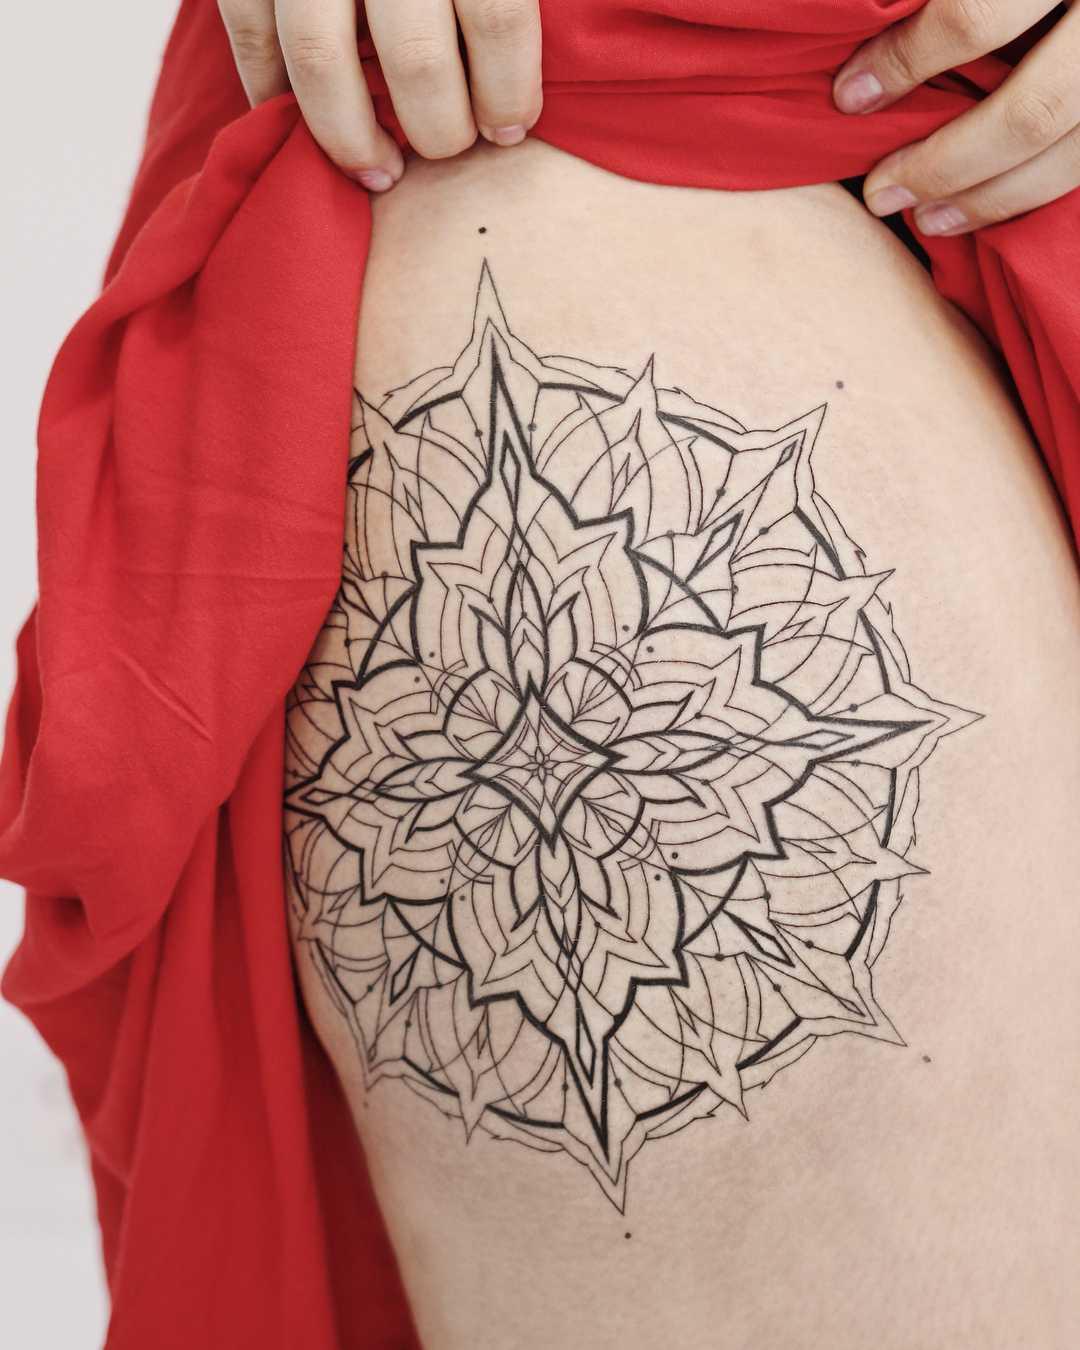 Linear black mandala tattoo on the hip